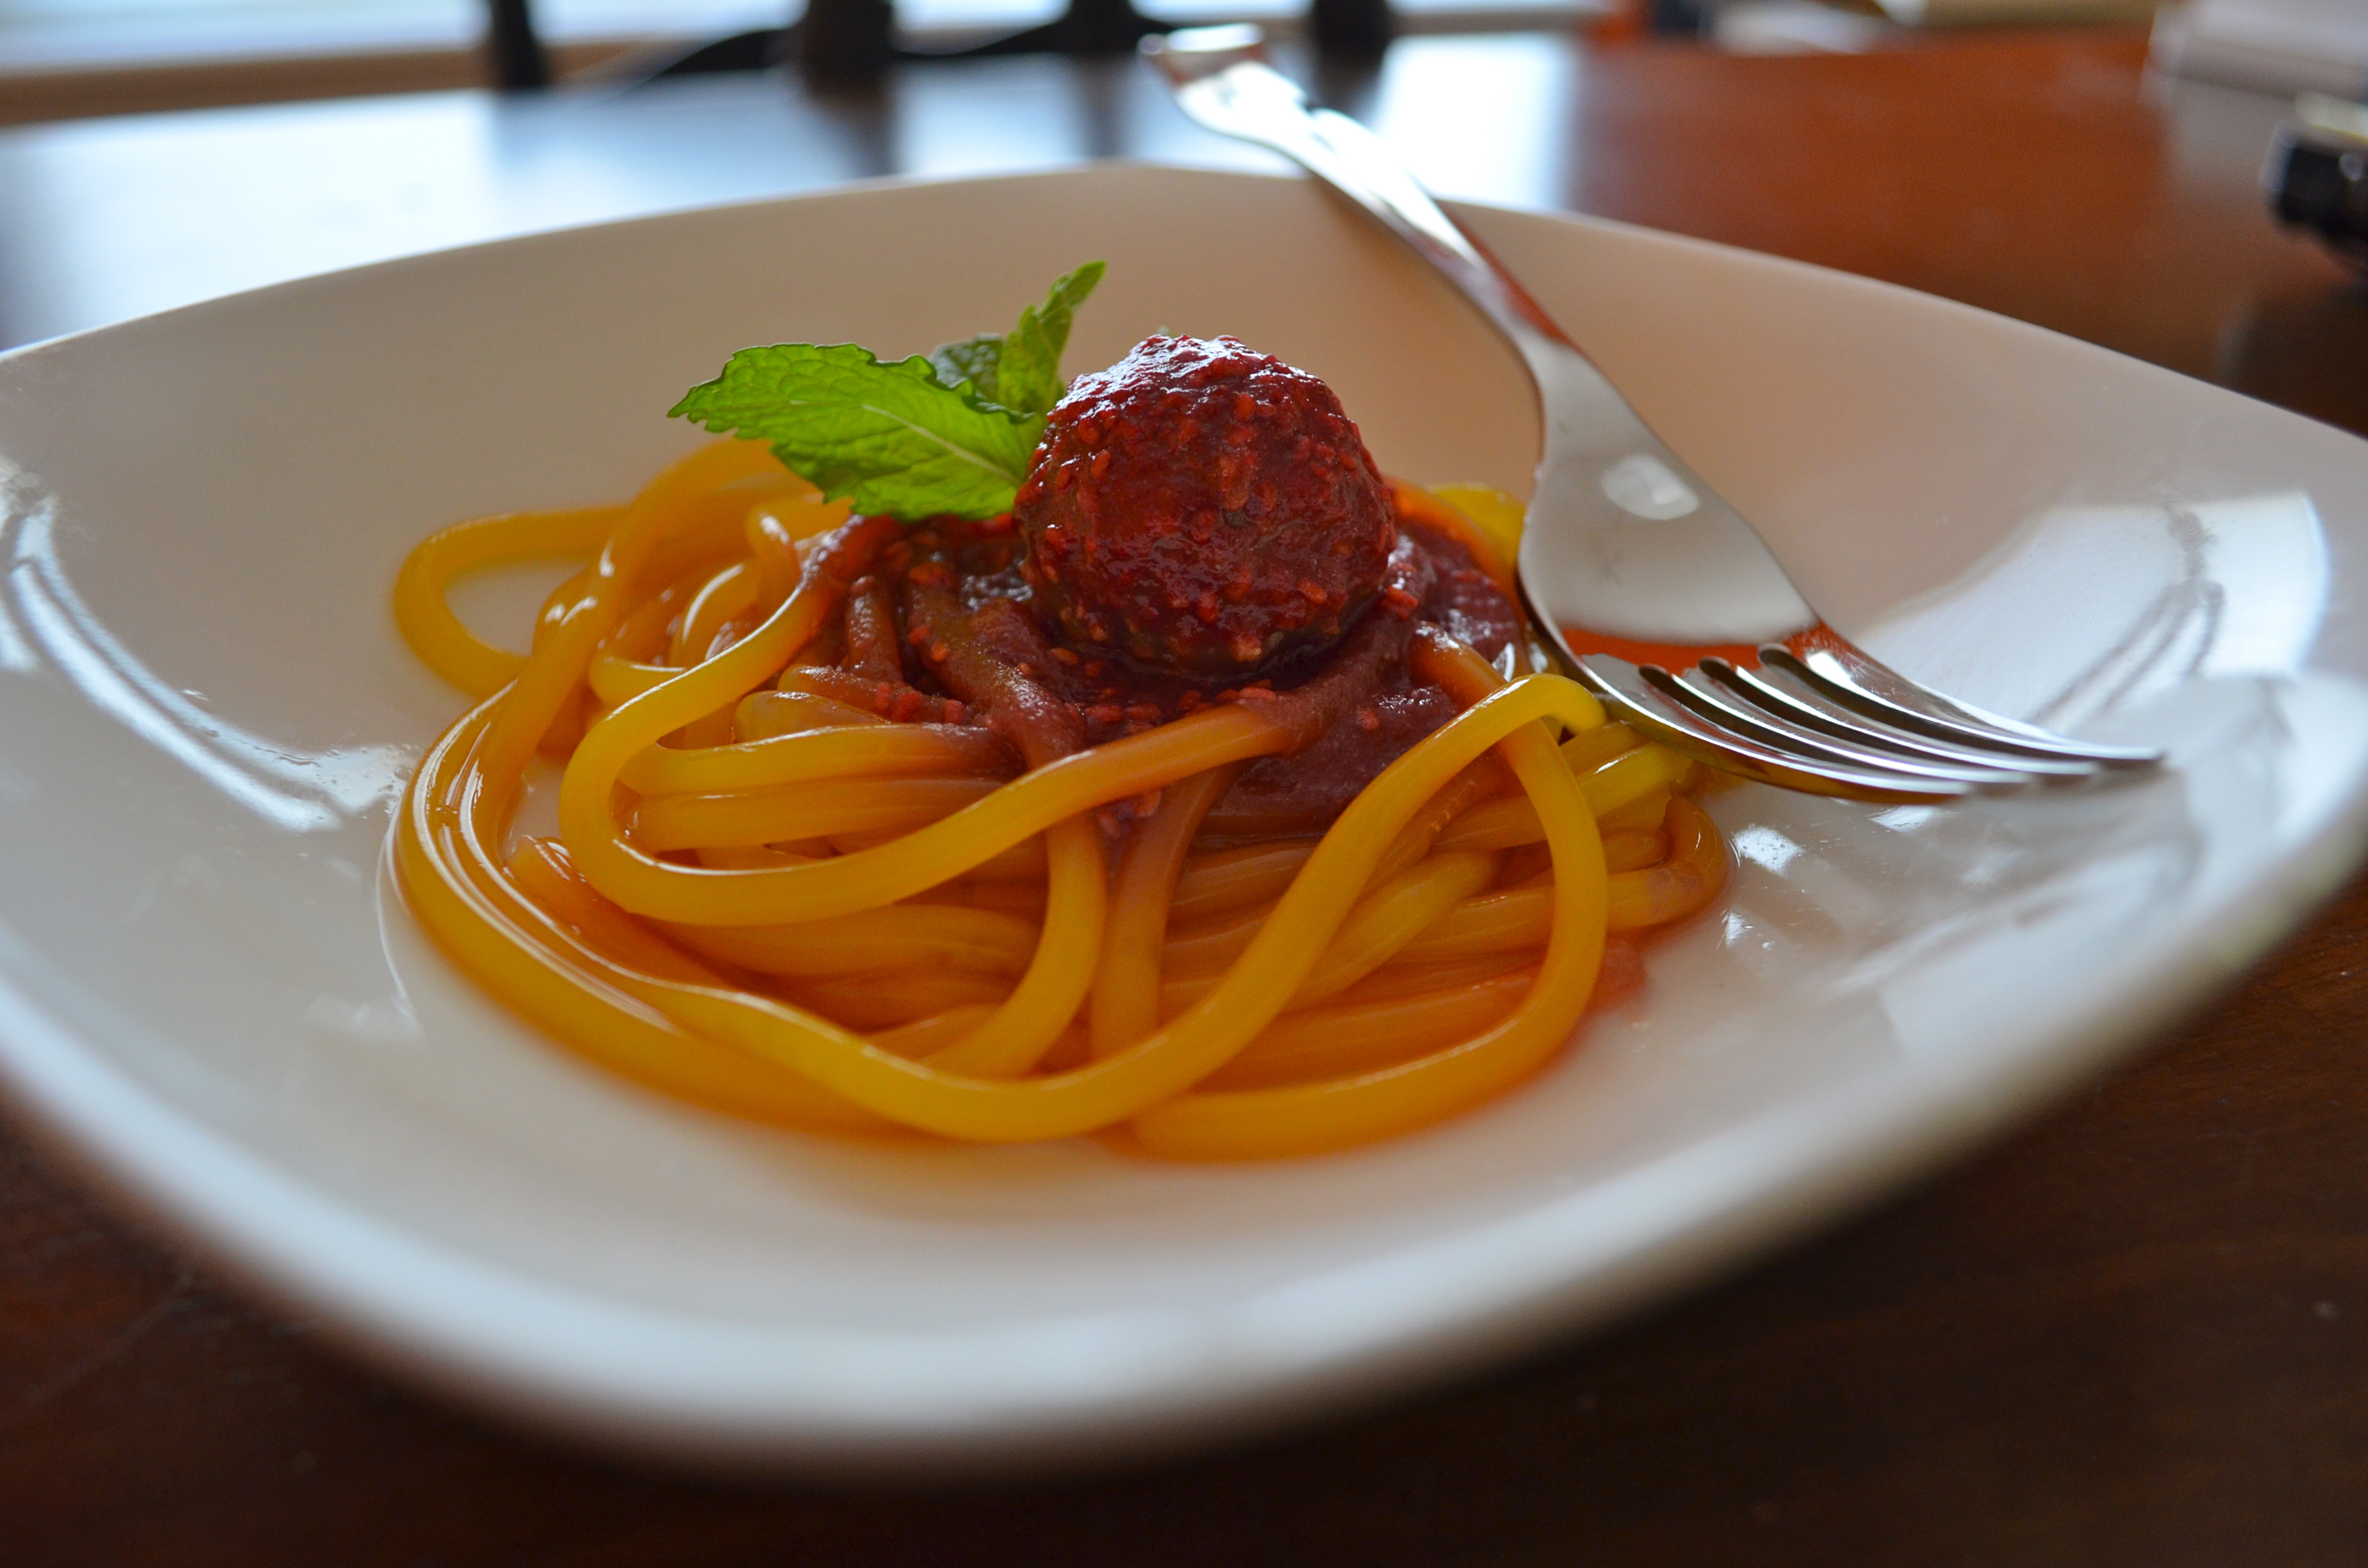 Mango Chocolate Raspberry Dessert Spaghetti